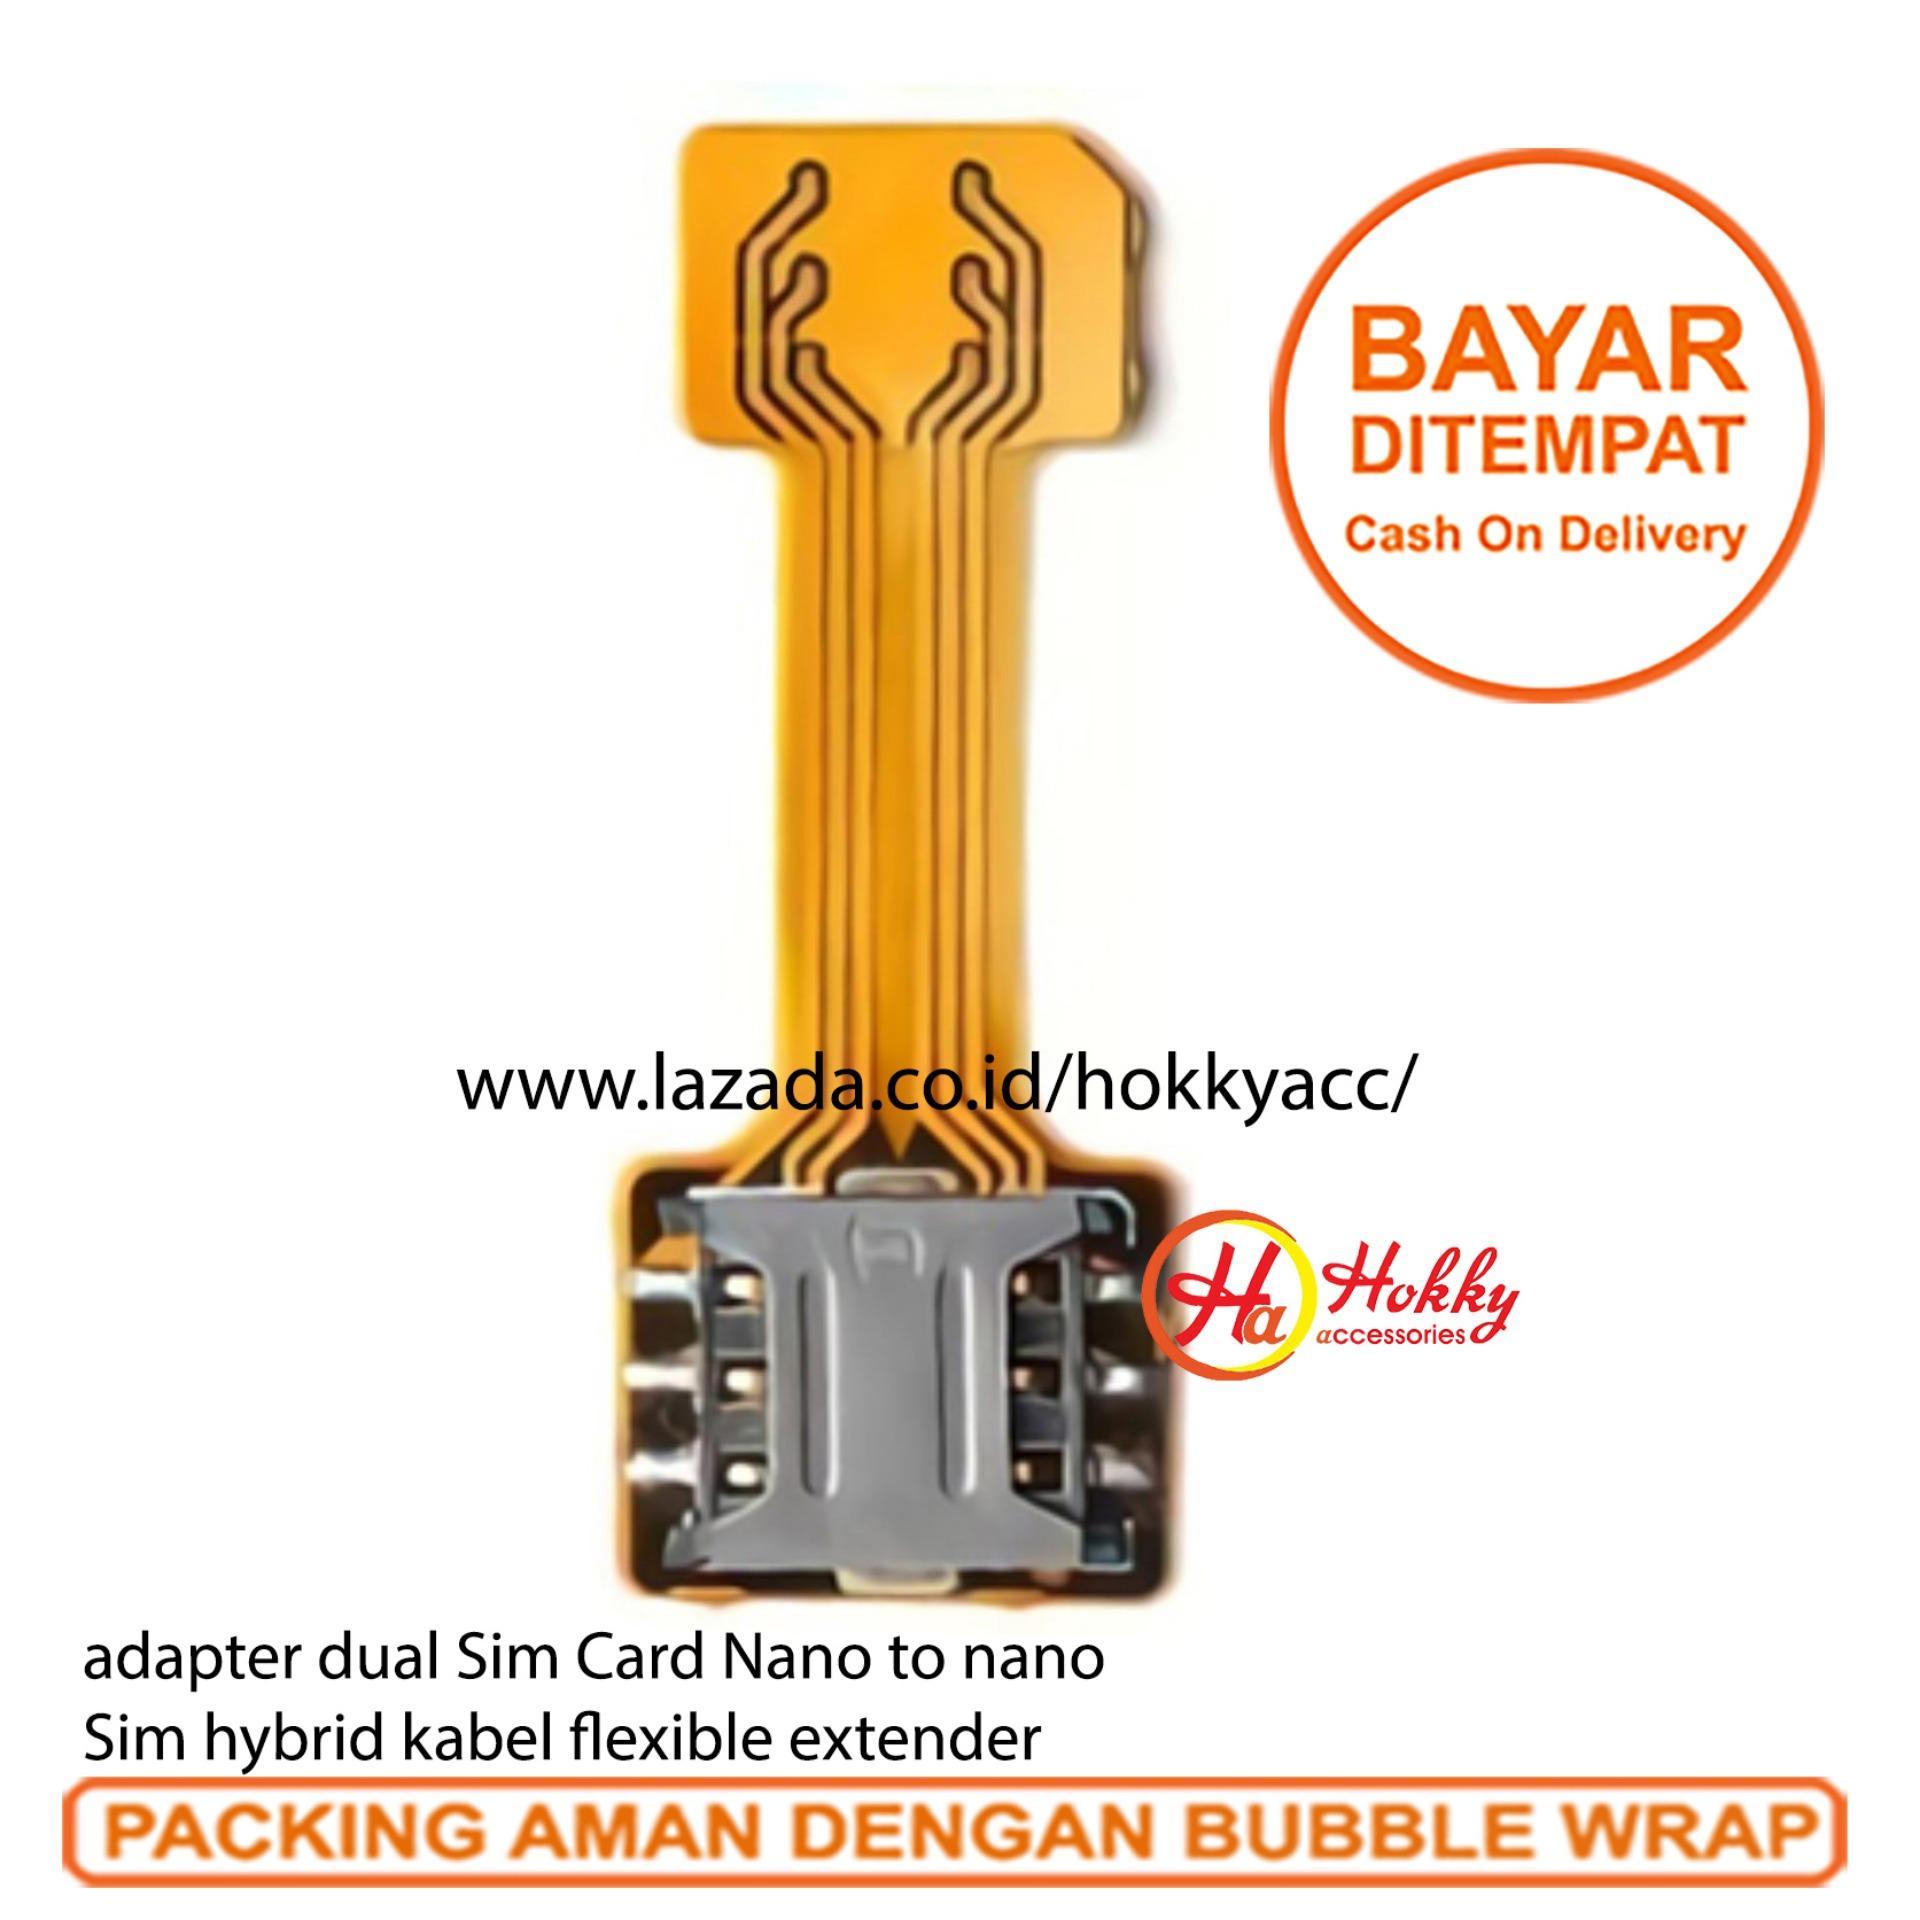 Adapter dual Sim Card Nano to nano sim hybrid kabel flexible extender